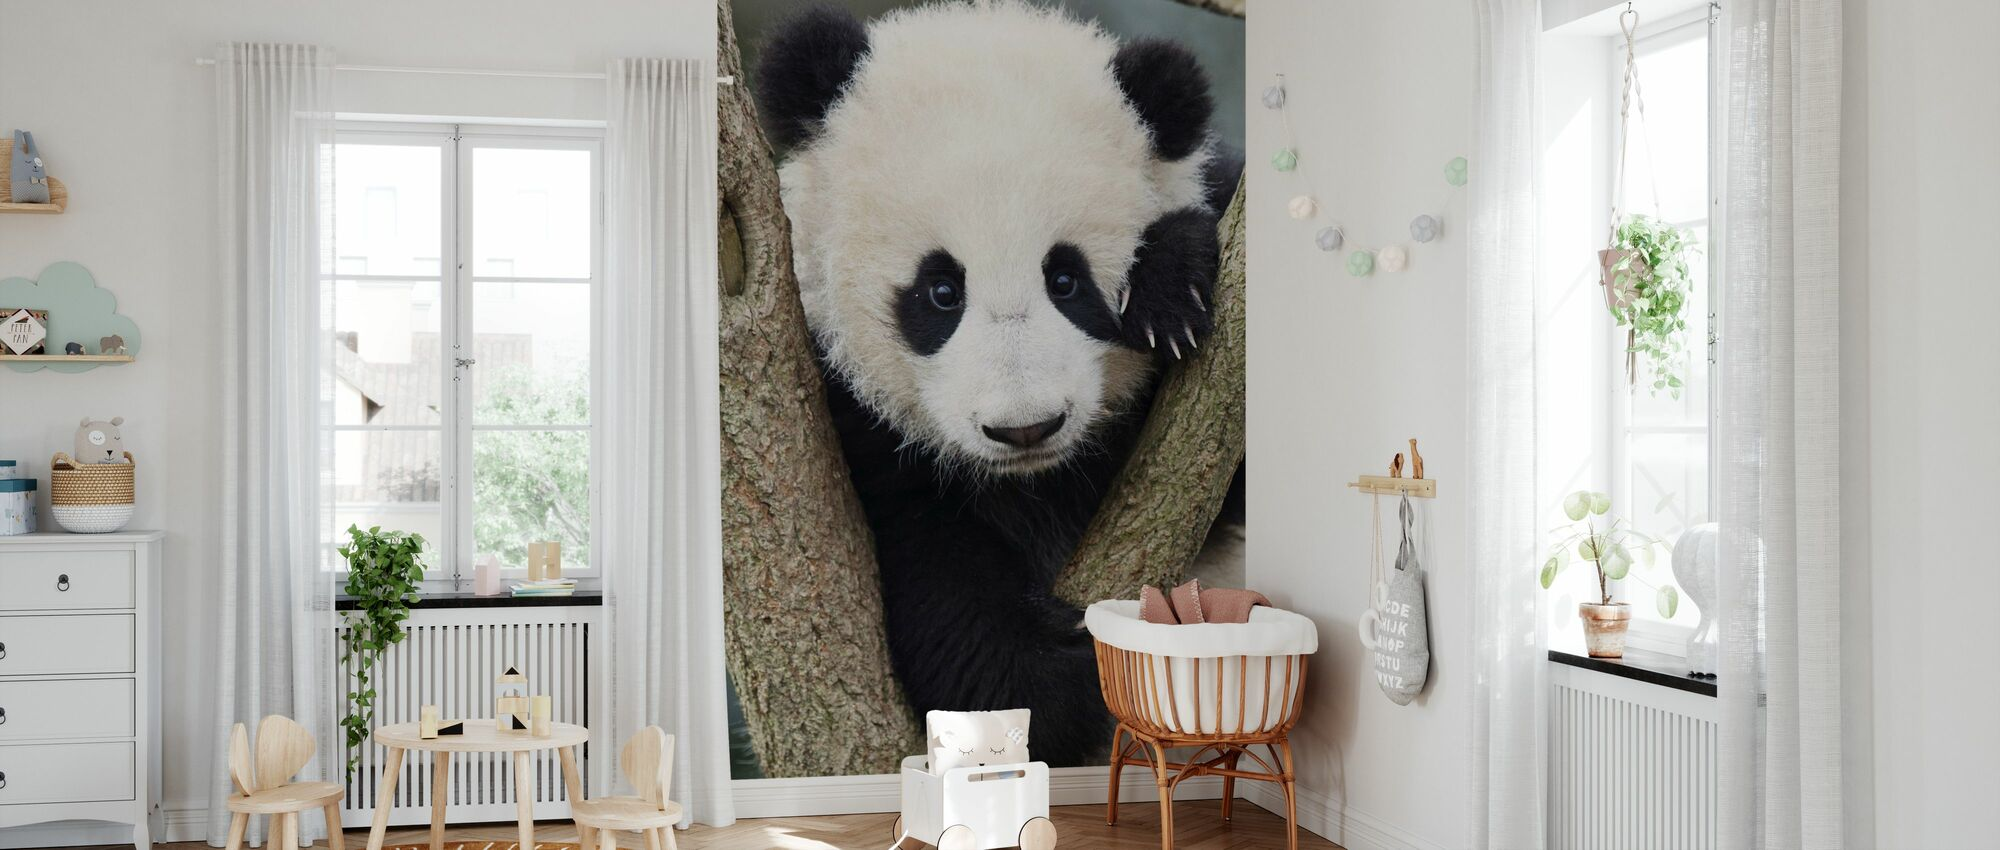 Giant Panda Cub - Wallpaper - Nursery